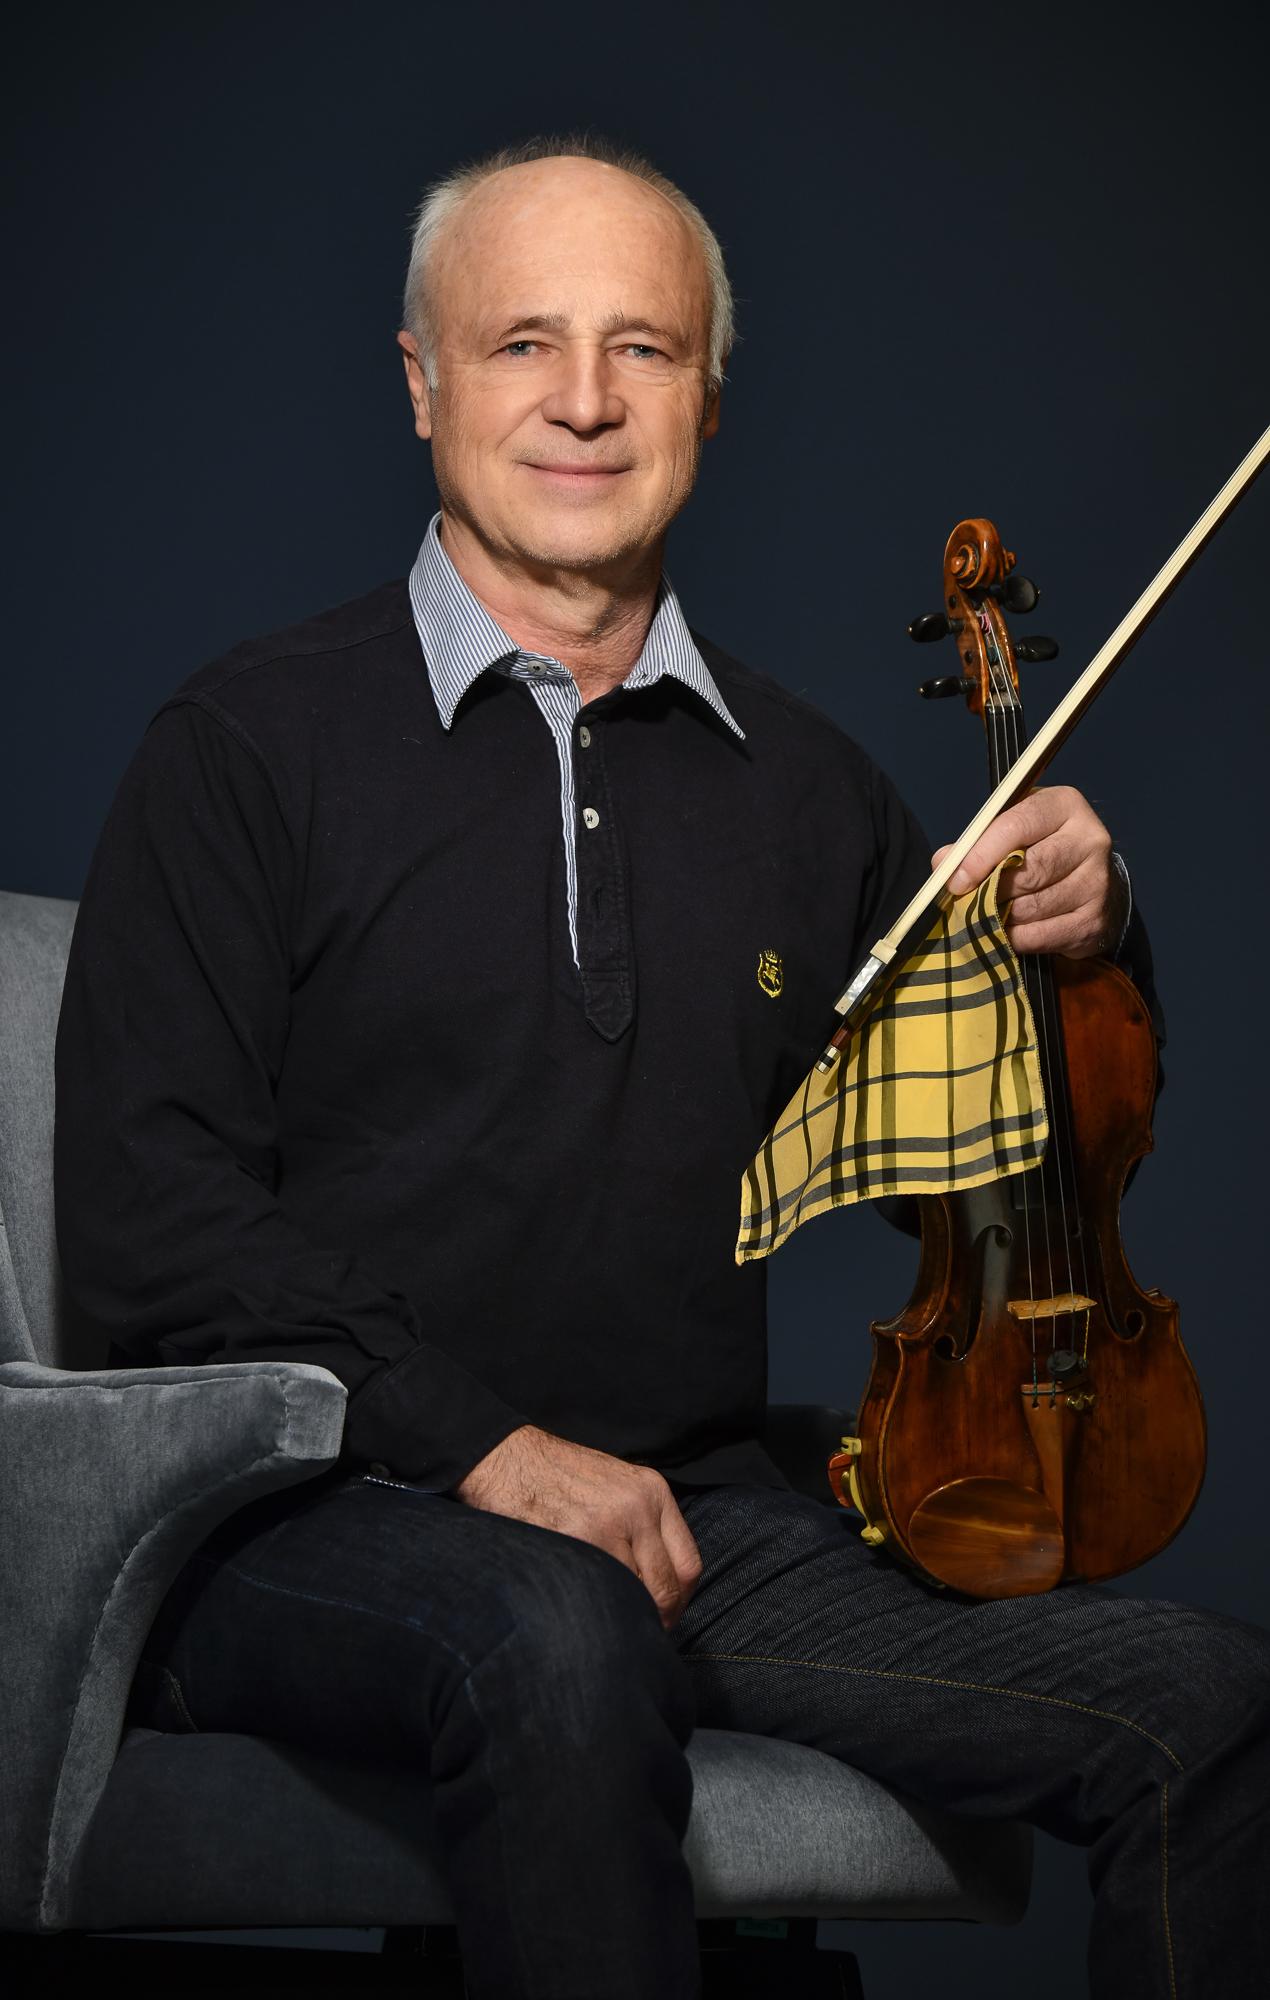 Jiří Suchomel